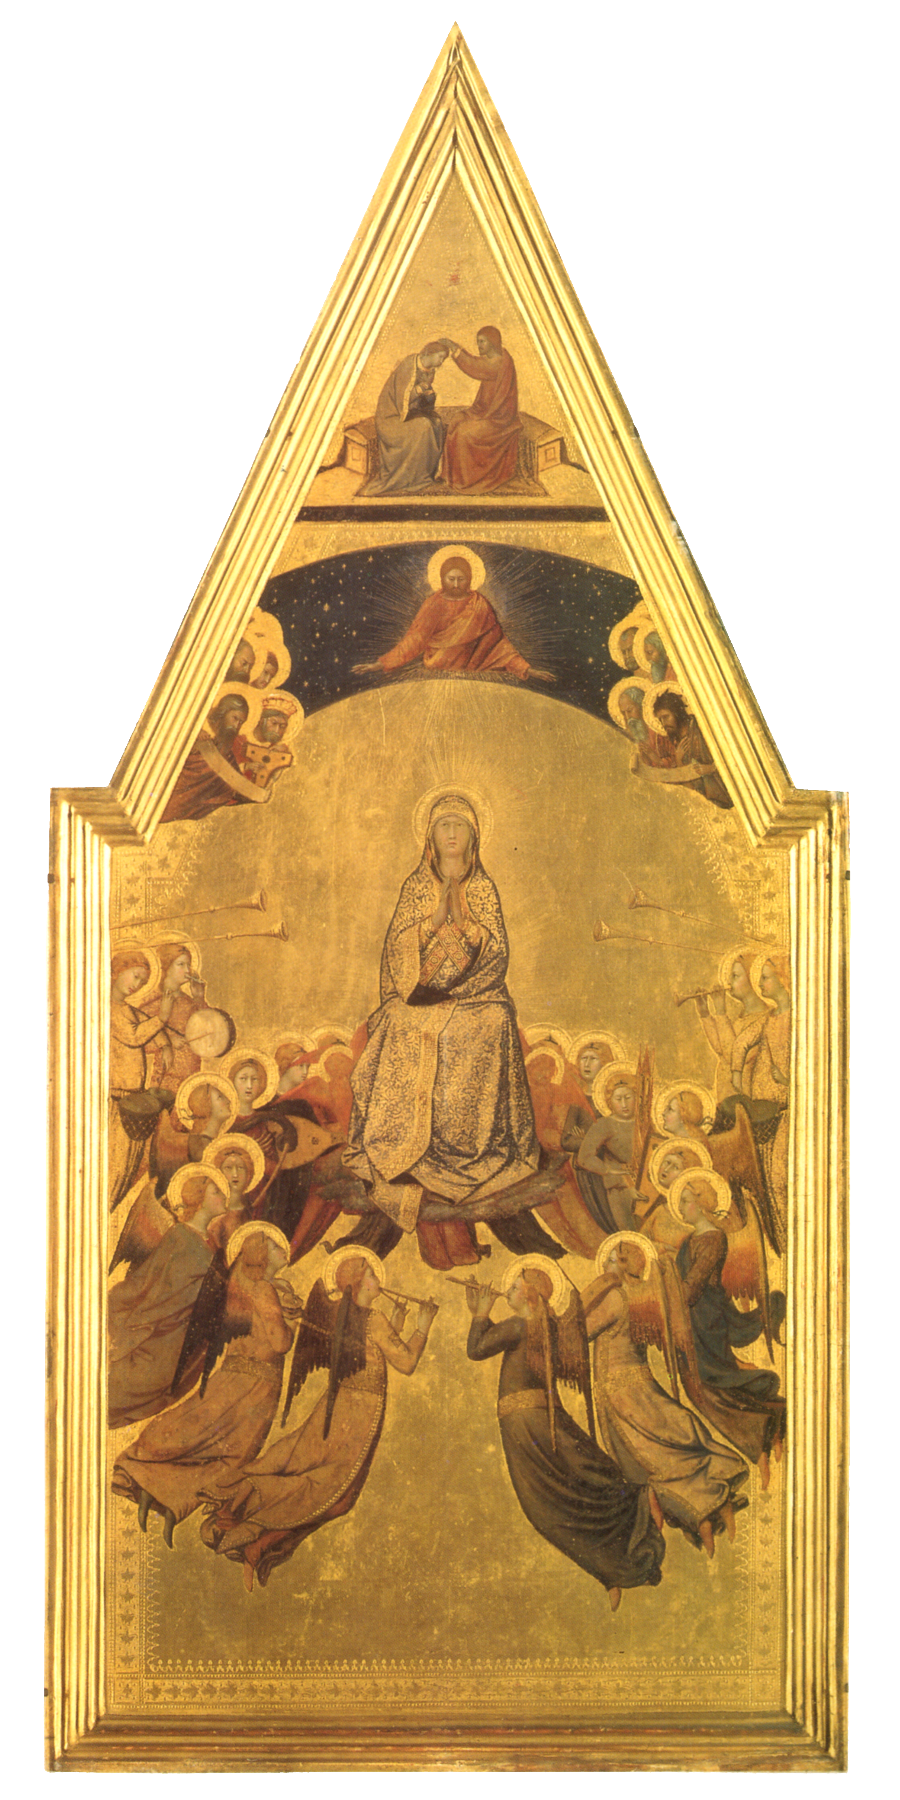 Lippo Memmi - Assunzione della Vergine (ca. 1340) - Monaco di Baviera - Bayerische Staatsgemaldesammlungen - Alte Pinakothek - #Siena #MonacoDiBaviera #LippoMemmi